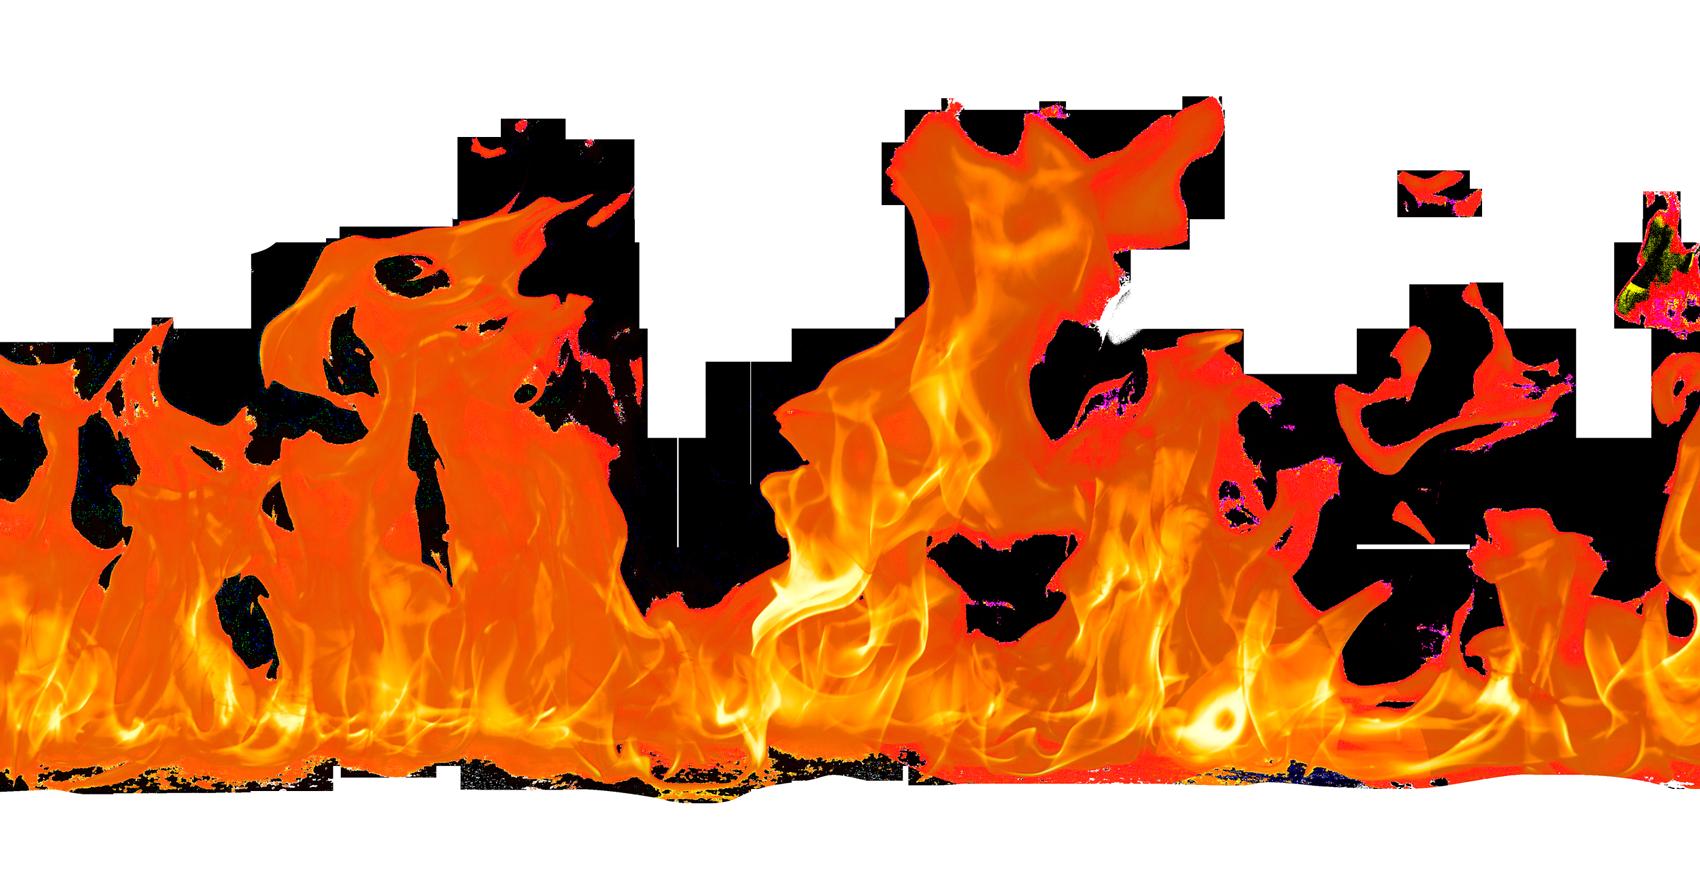 Orange Smoke Background Picsart